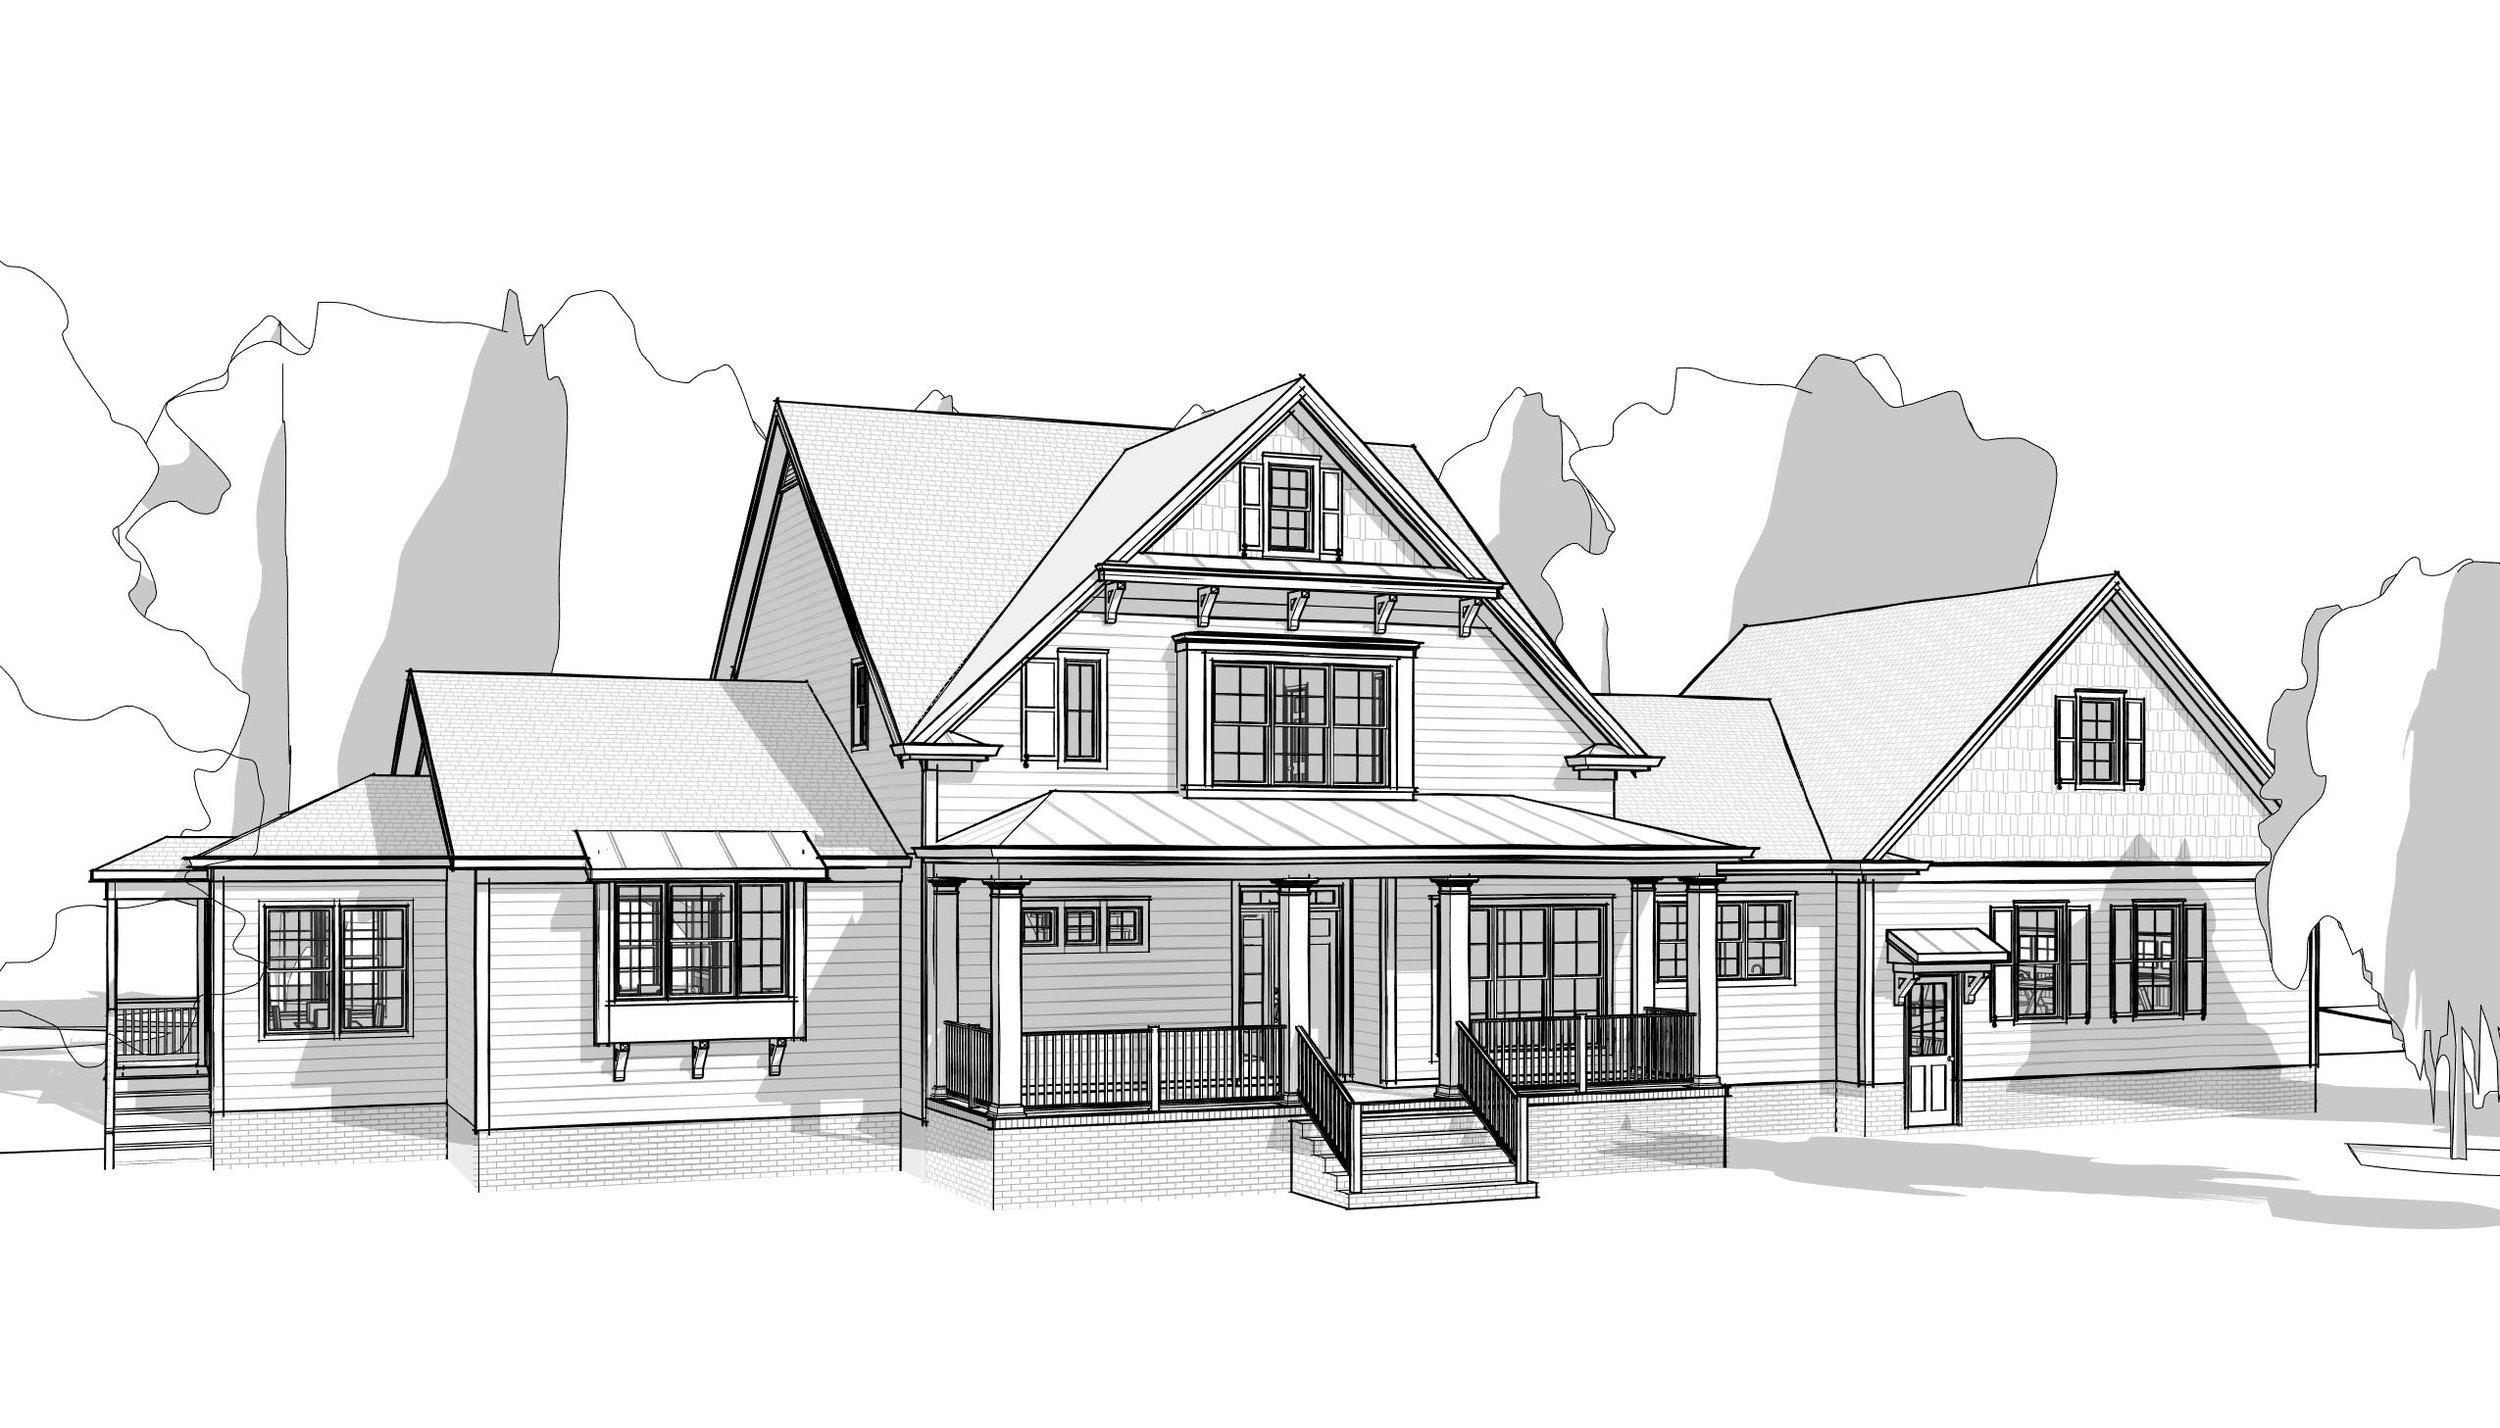 Contemporary Farmhouse in 3D